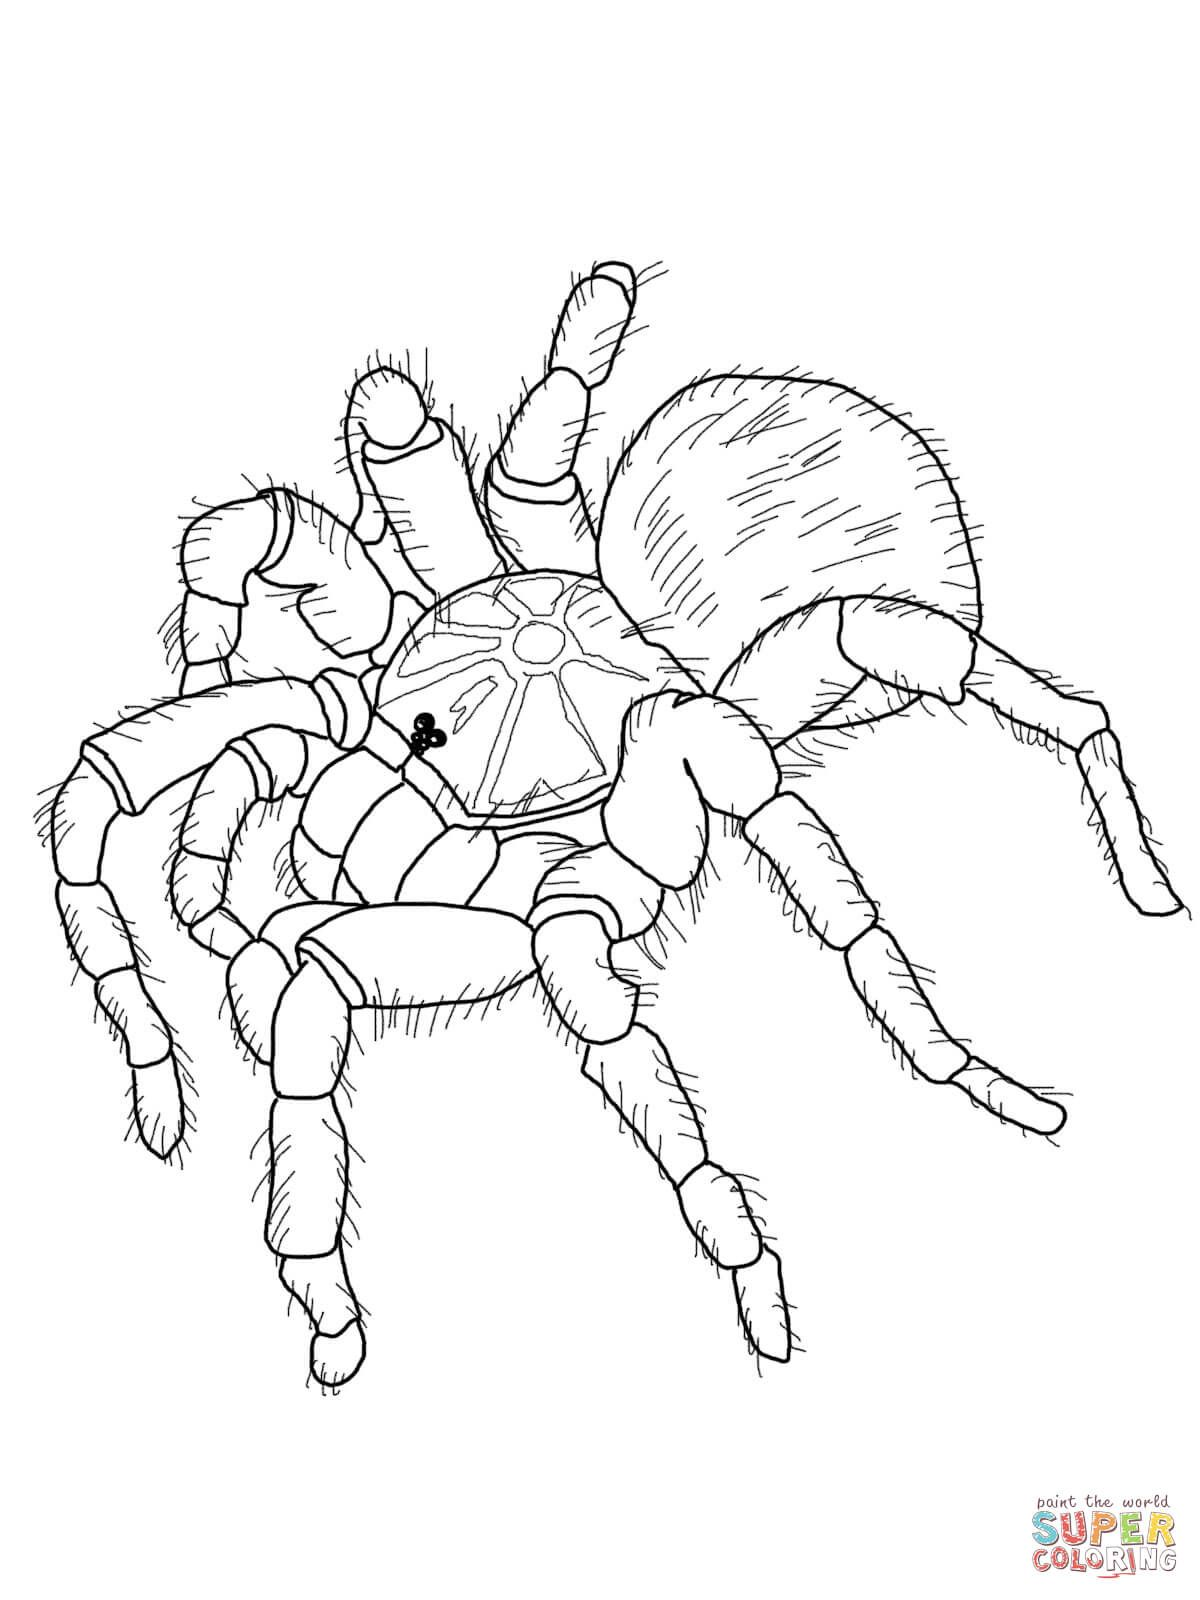 Vogelspinnen Ausmalbilder Ausmalbilder Vogelspinnen Animal